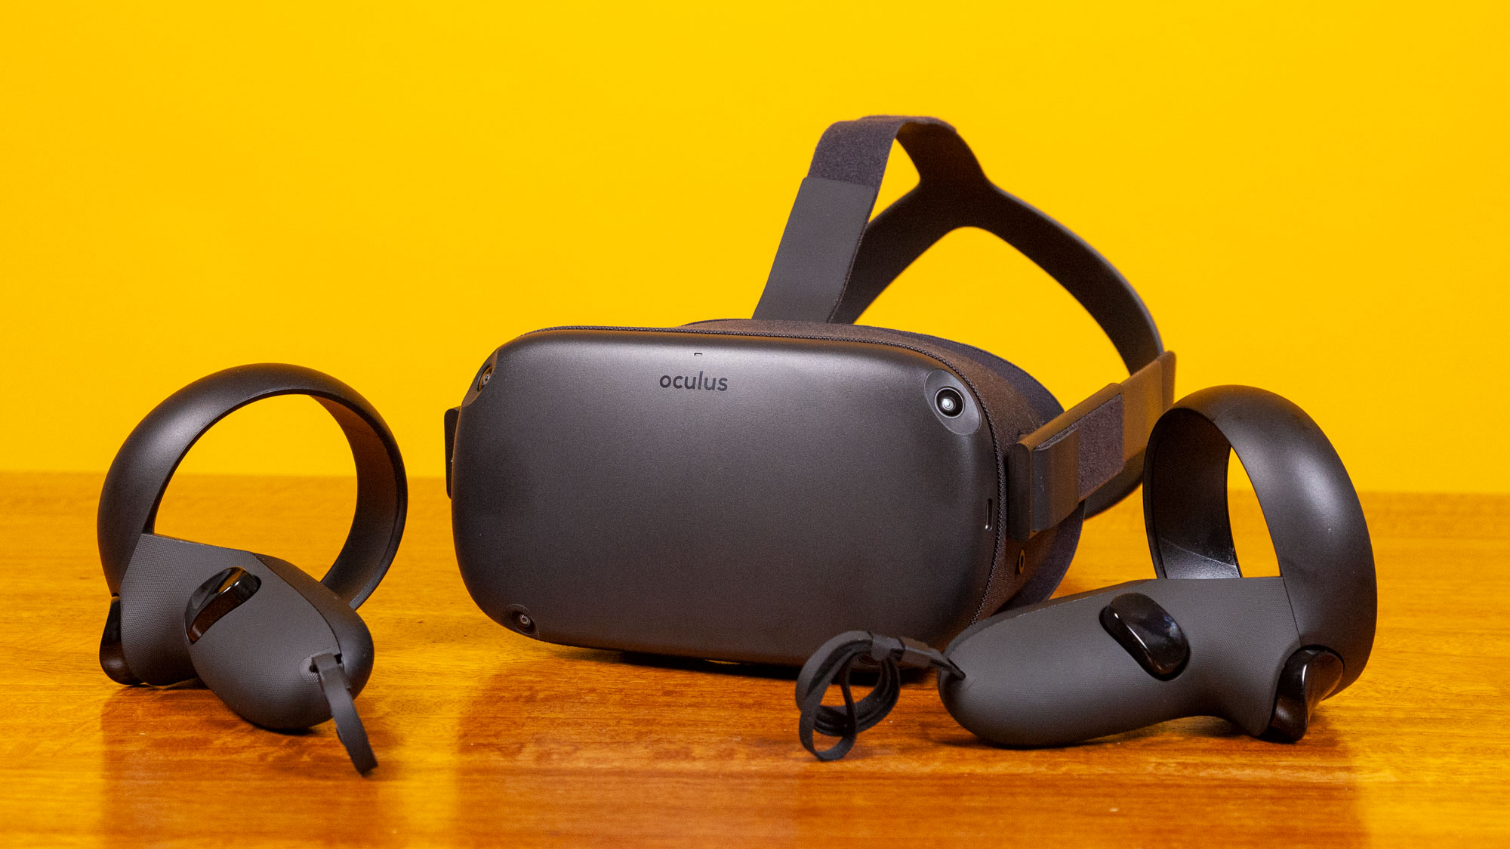 Oculus láme rekordy Oculus Quest